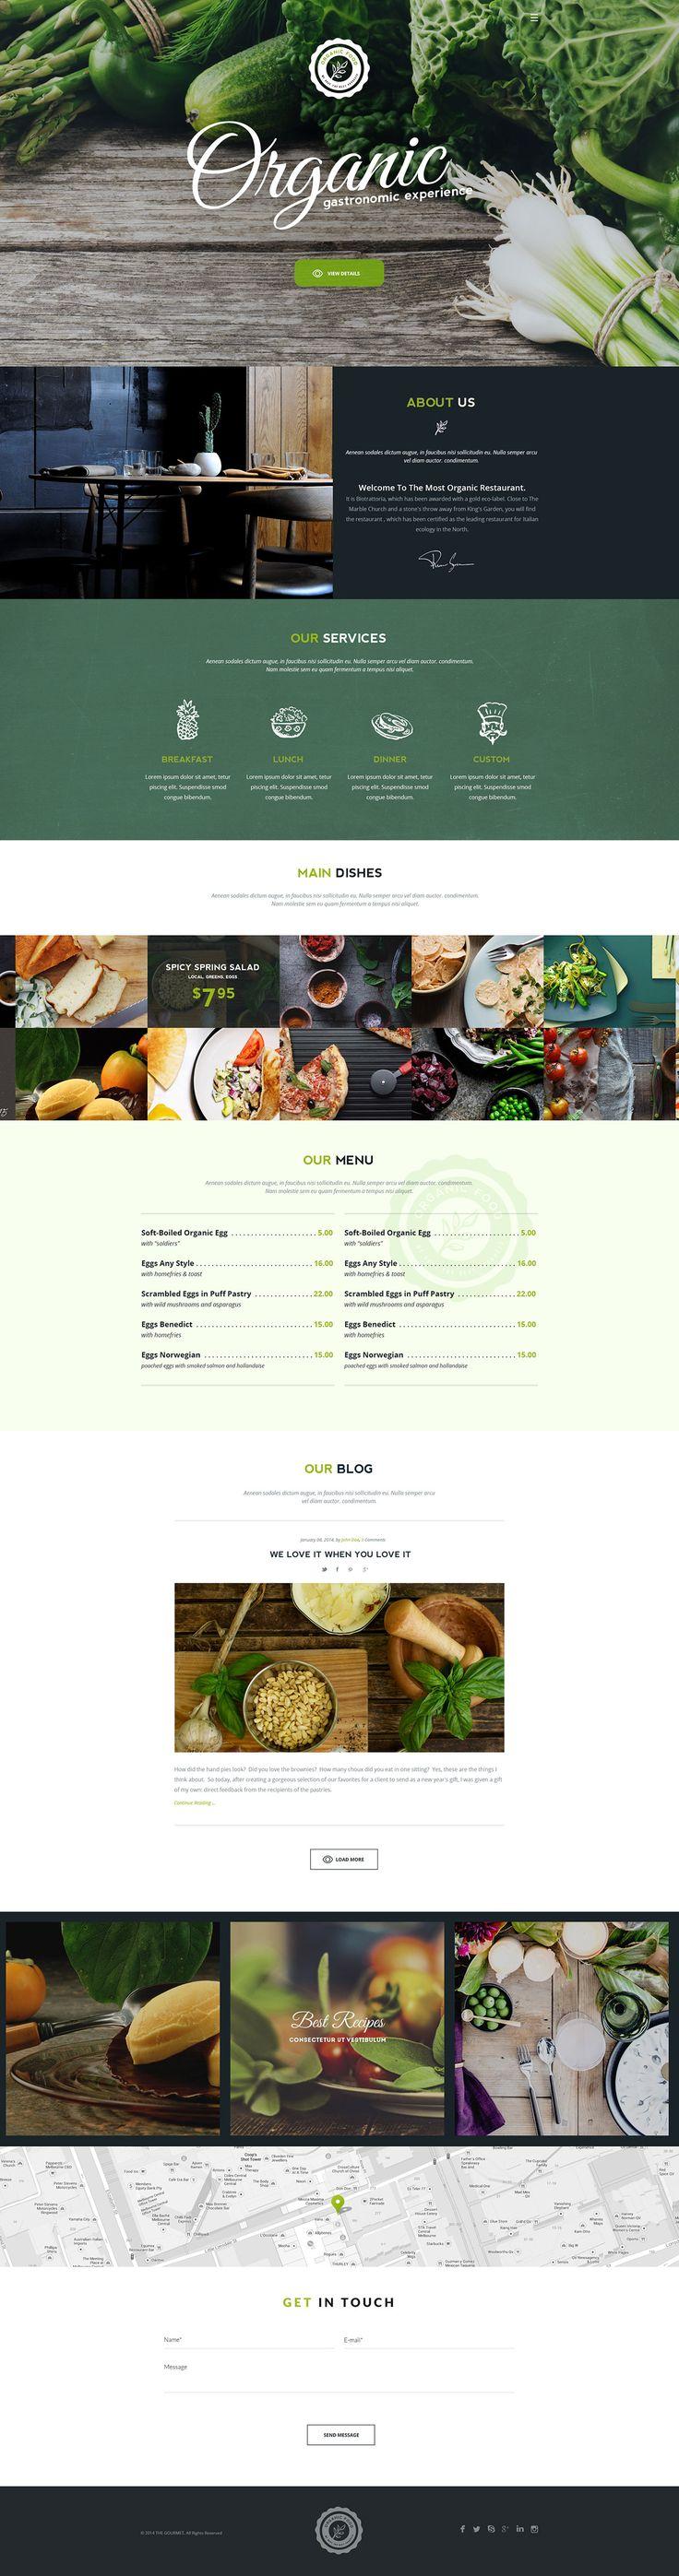 Organic - Food&Restaurant Theme on Behance